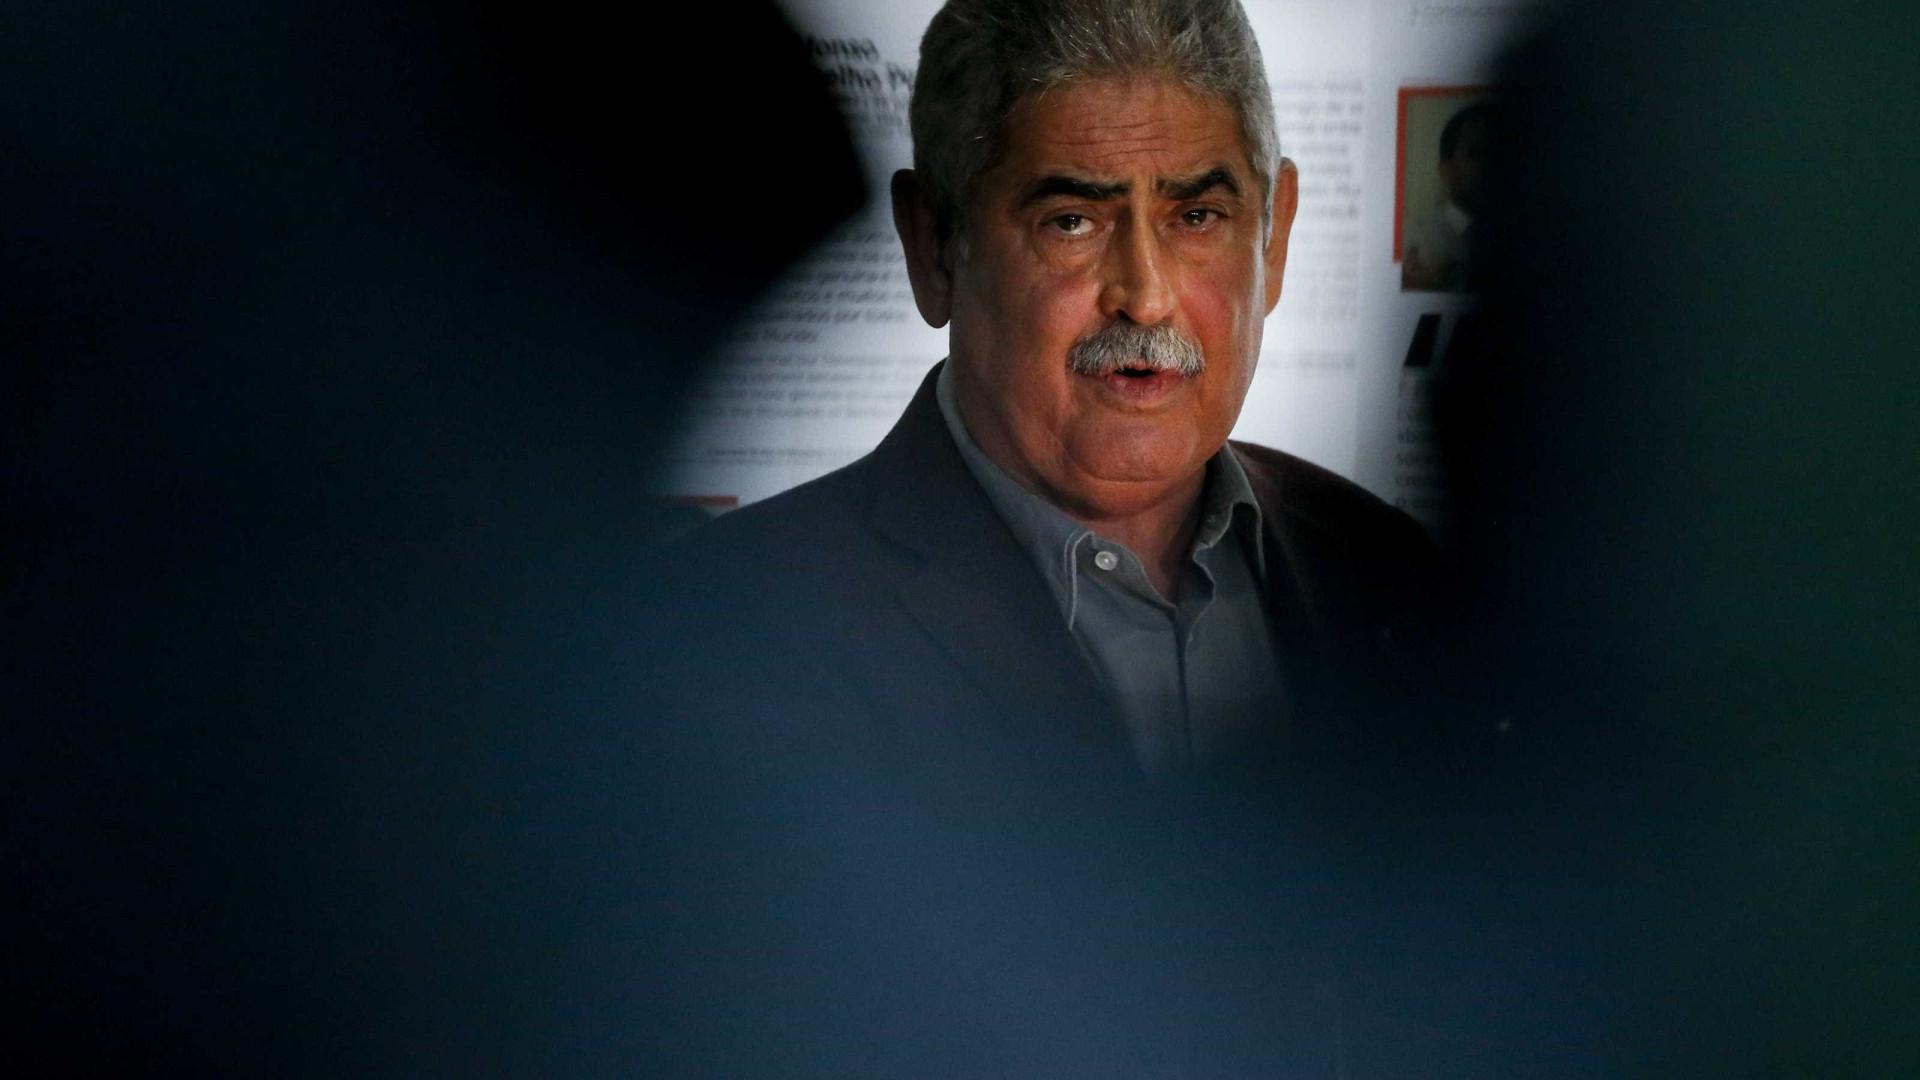 Luís Filipe Vieira está a ser ouvido como testemunha no DIAP